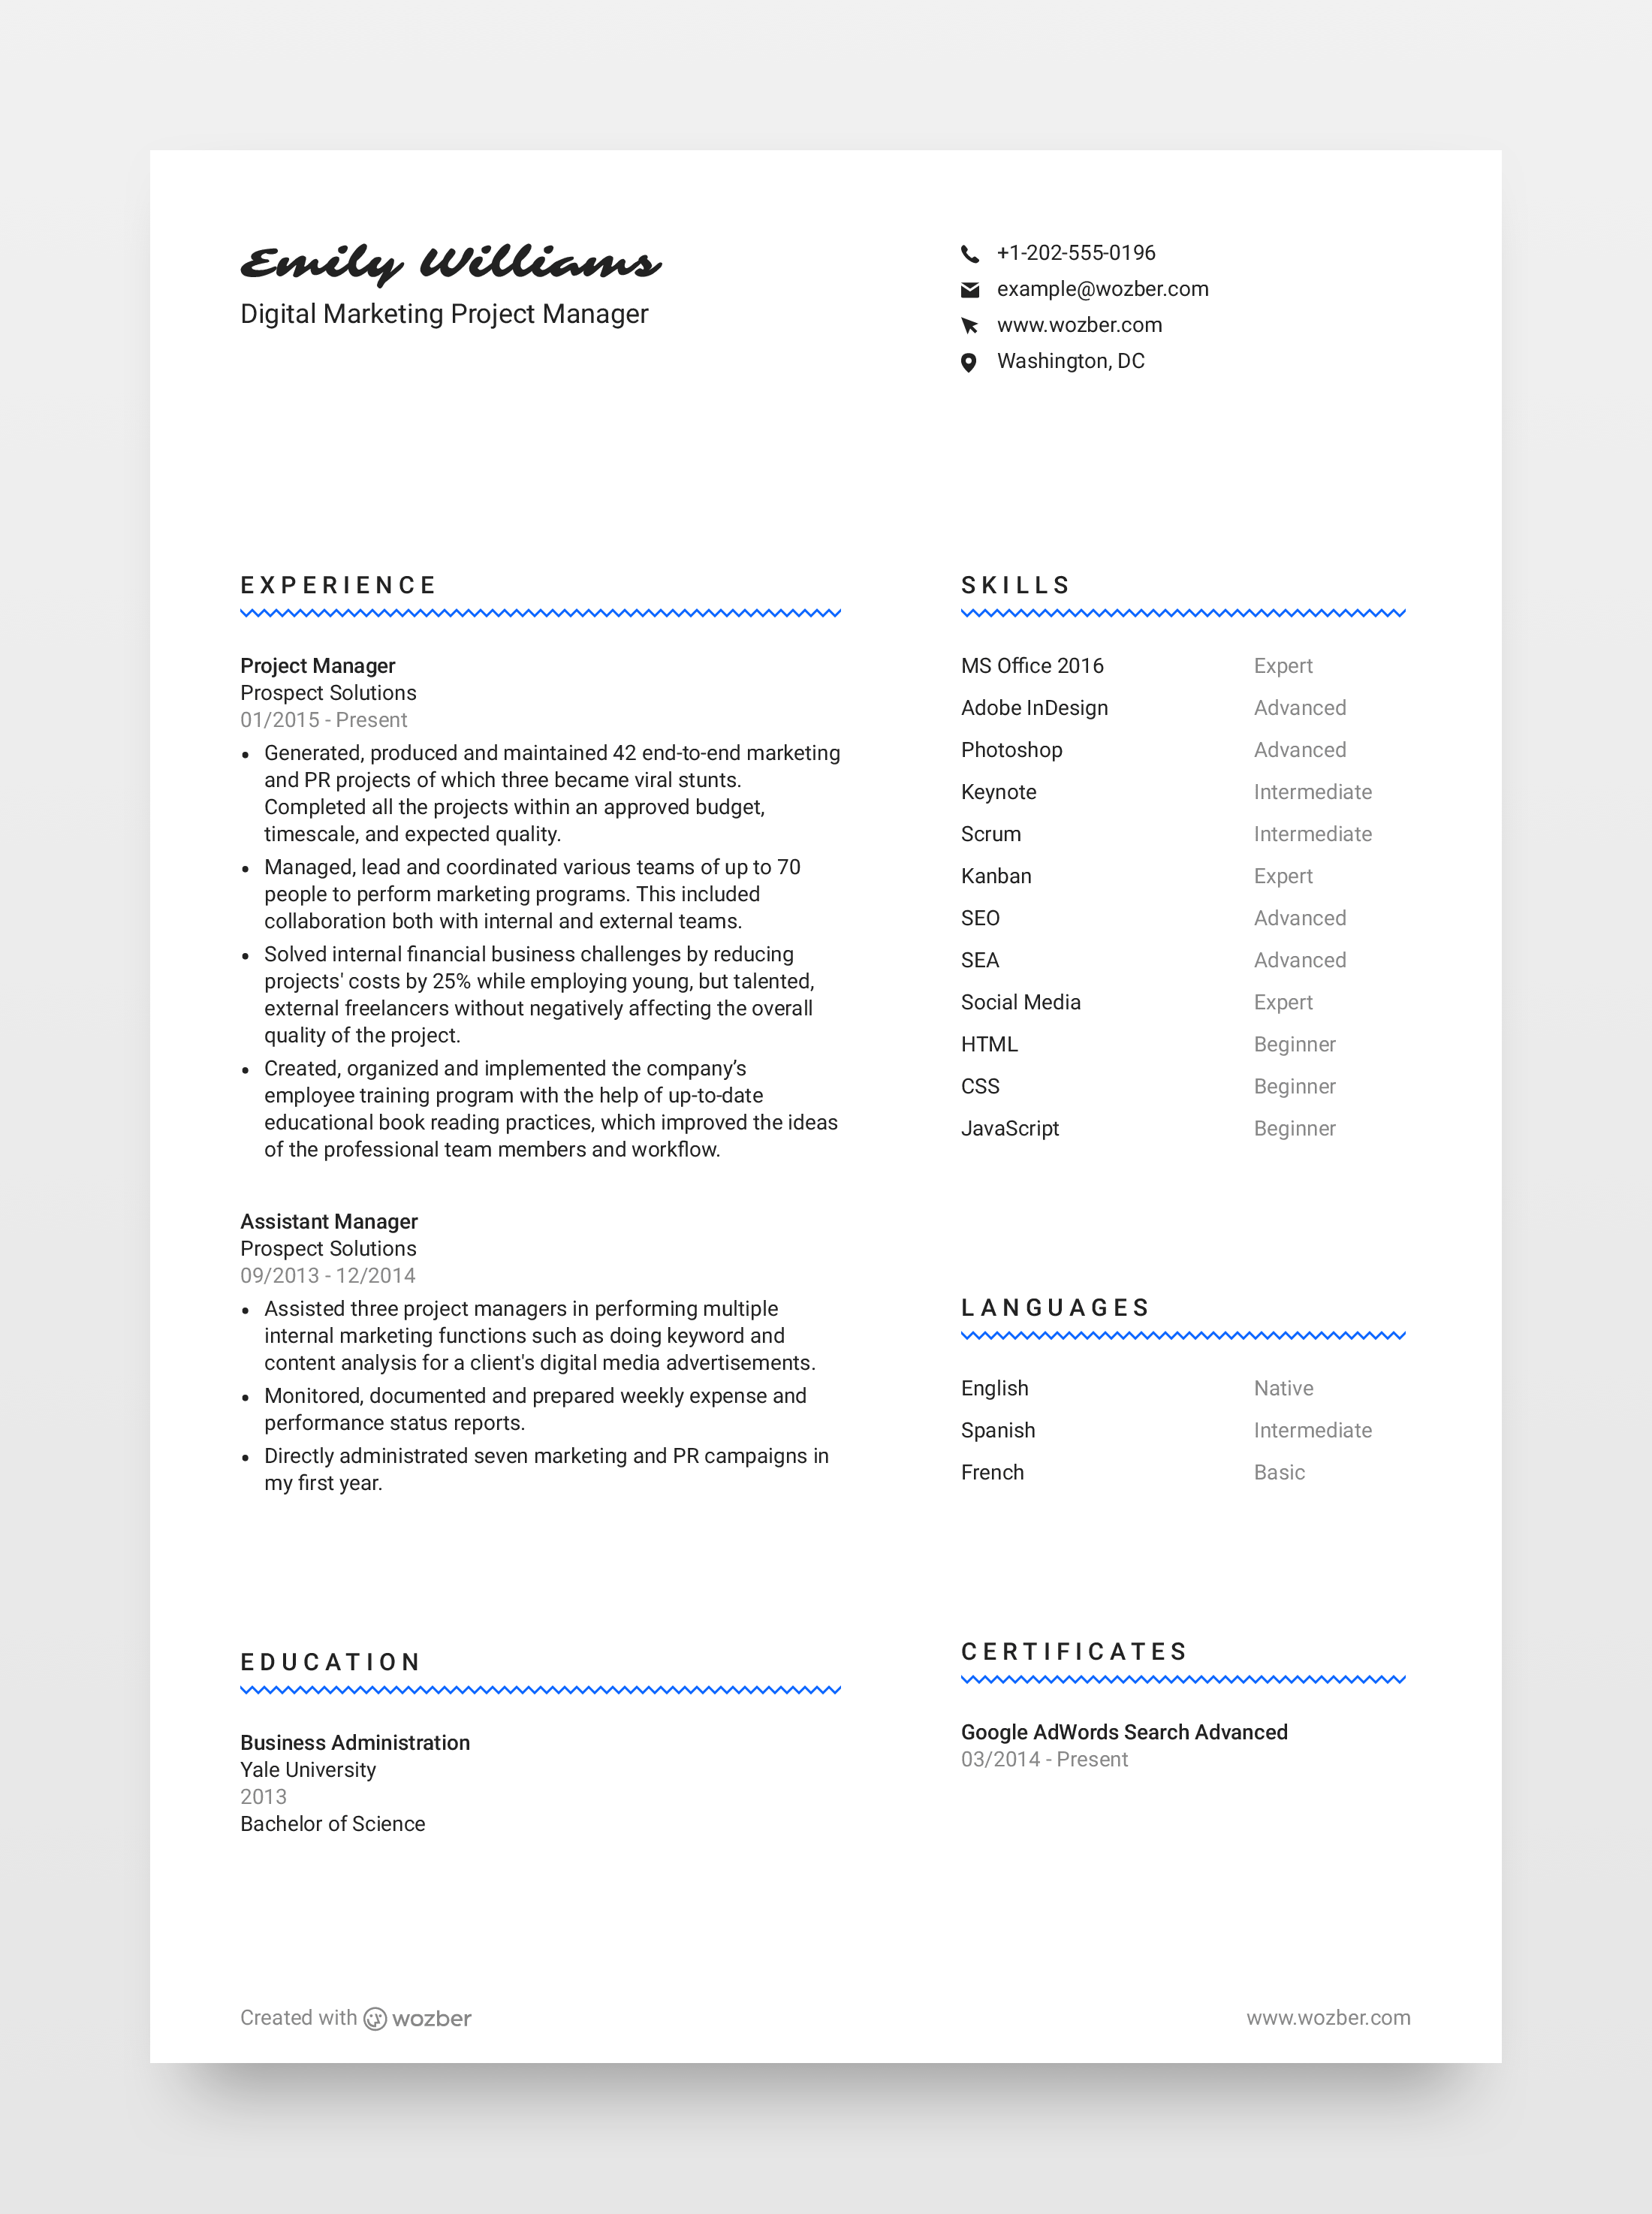 Free Resume Template 4 Wozber Resume Template Free Unique Resume Template Resume Template